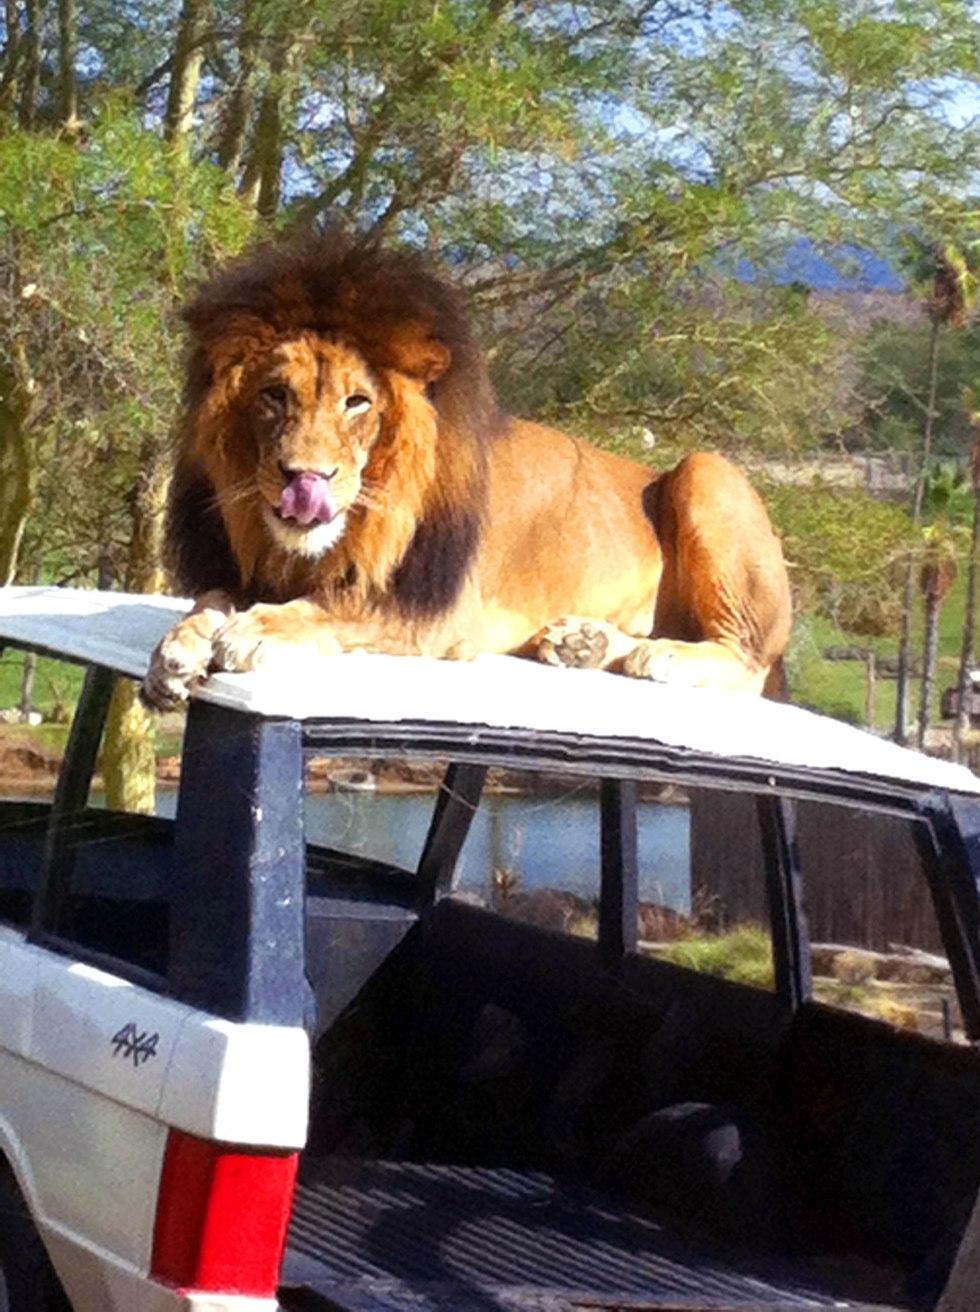 Safari-Park-Cat-Got-Your-Tongue-